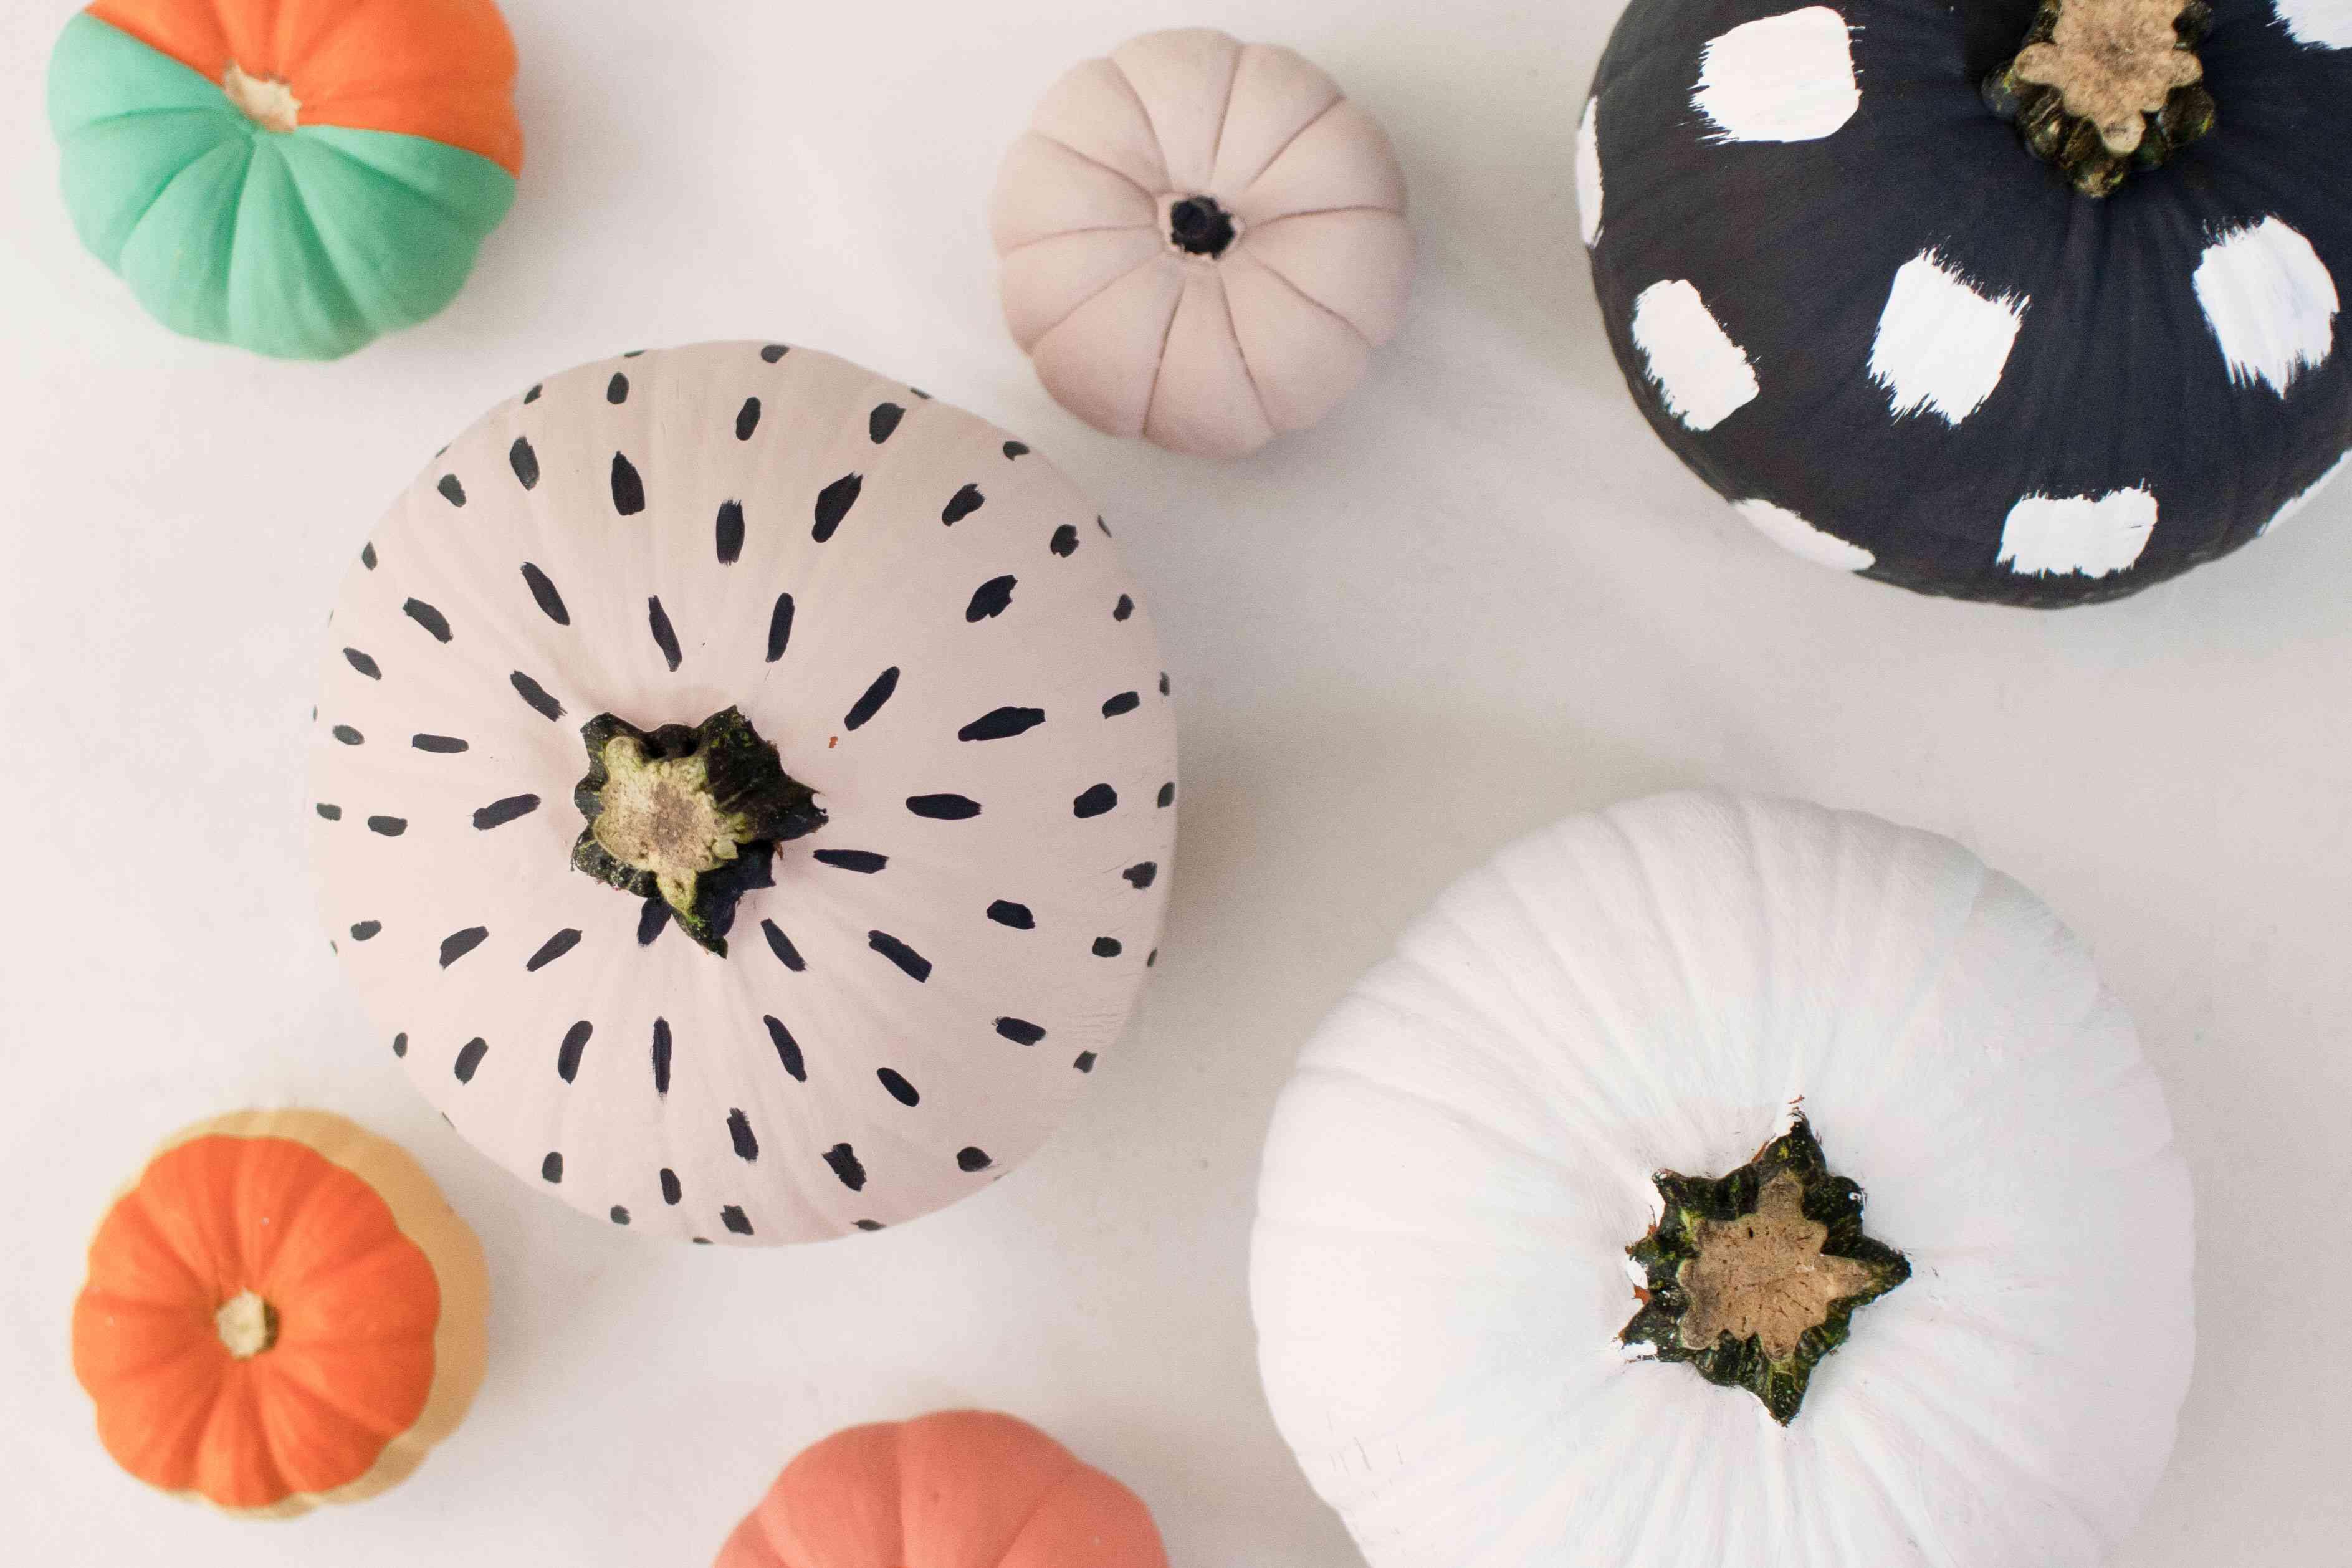 Patterned pumpkins on white background